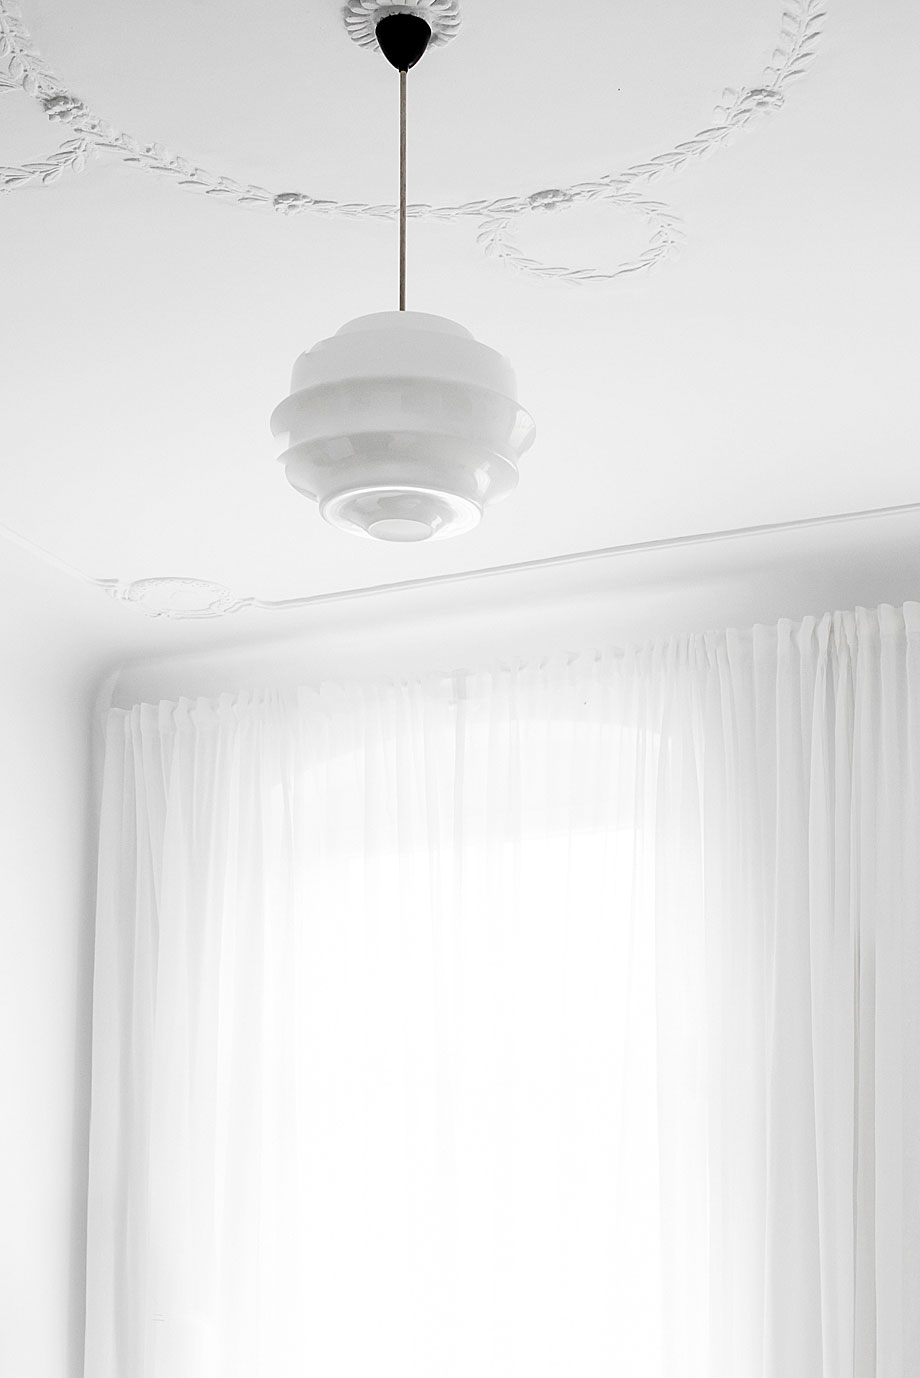 apartamento-tenement-loft-kolasinski (11)